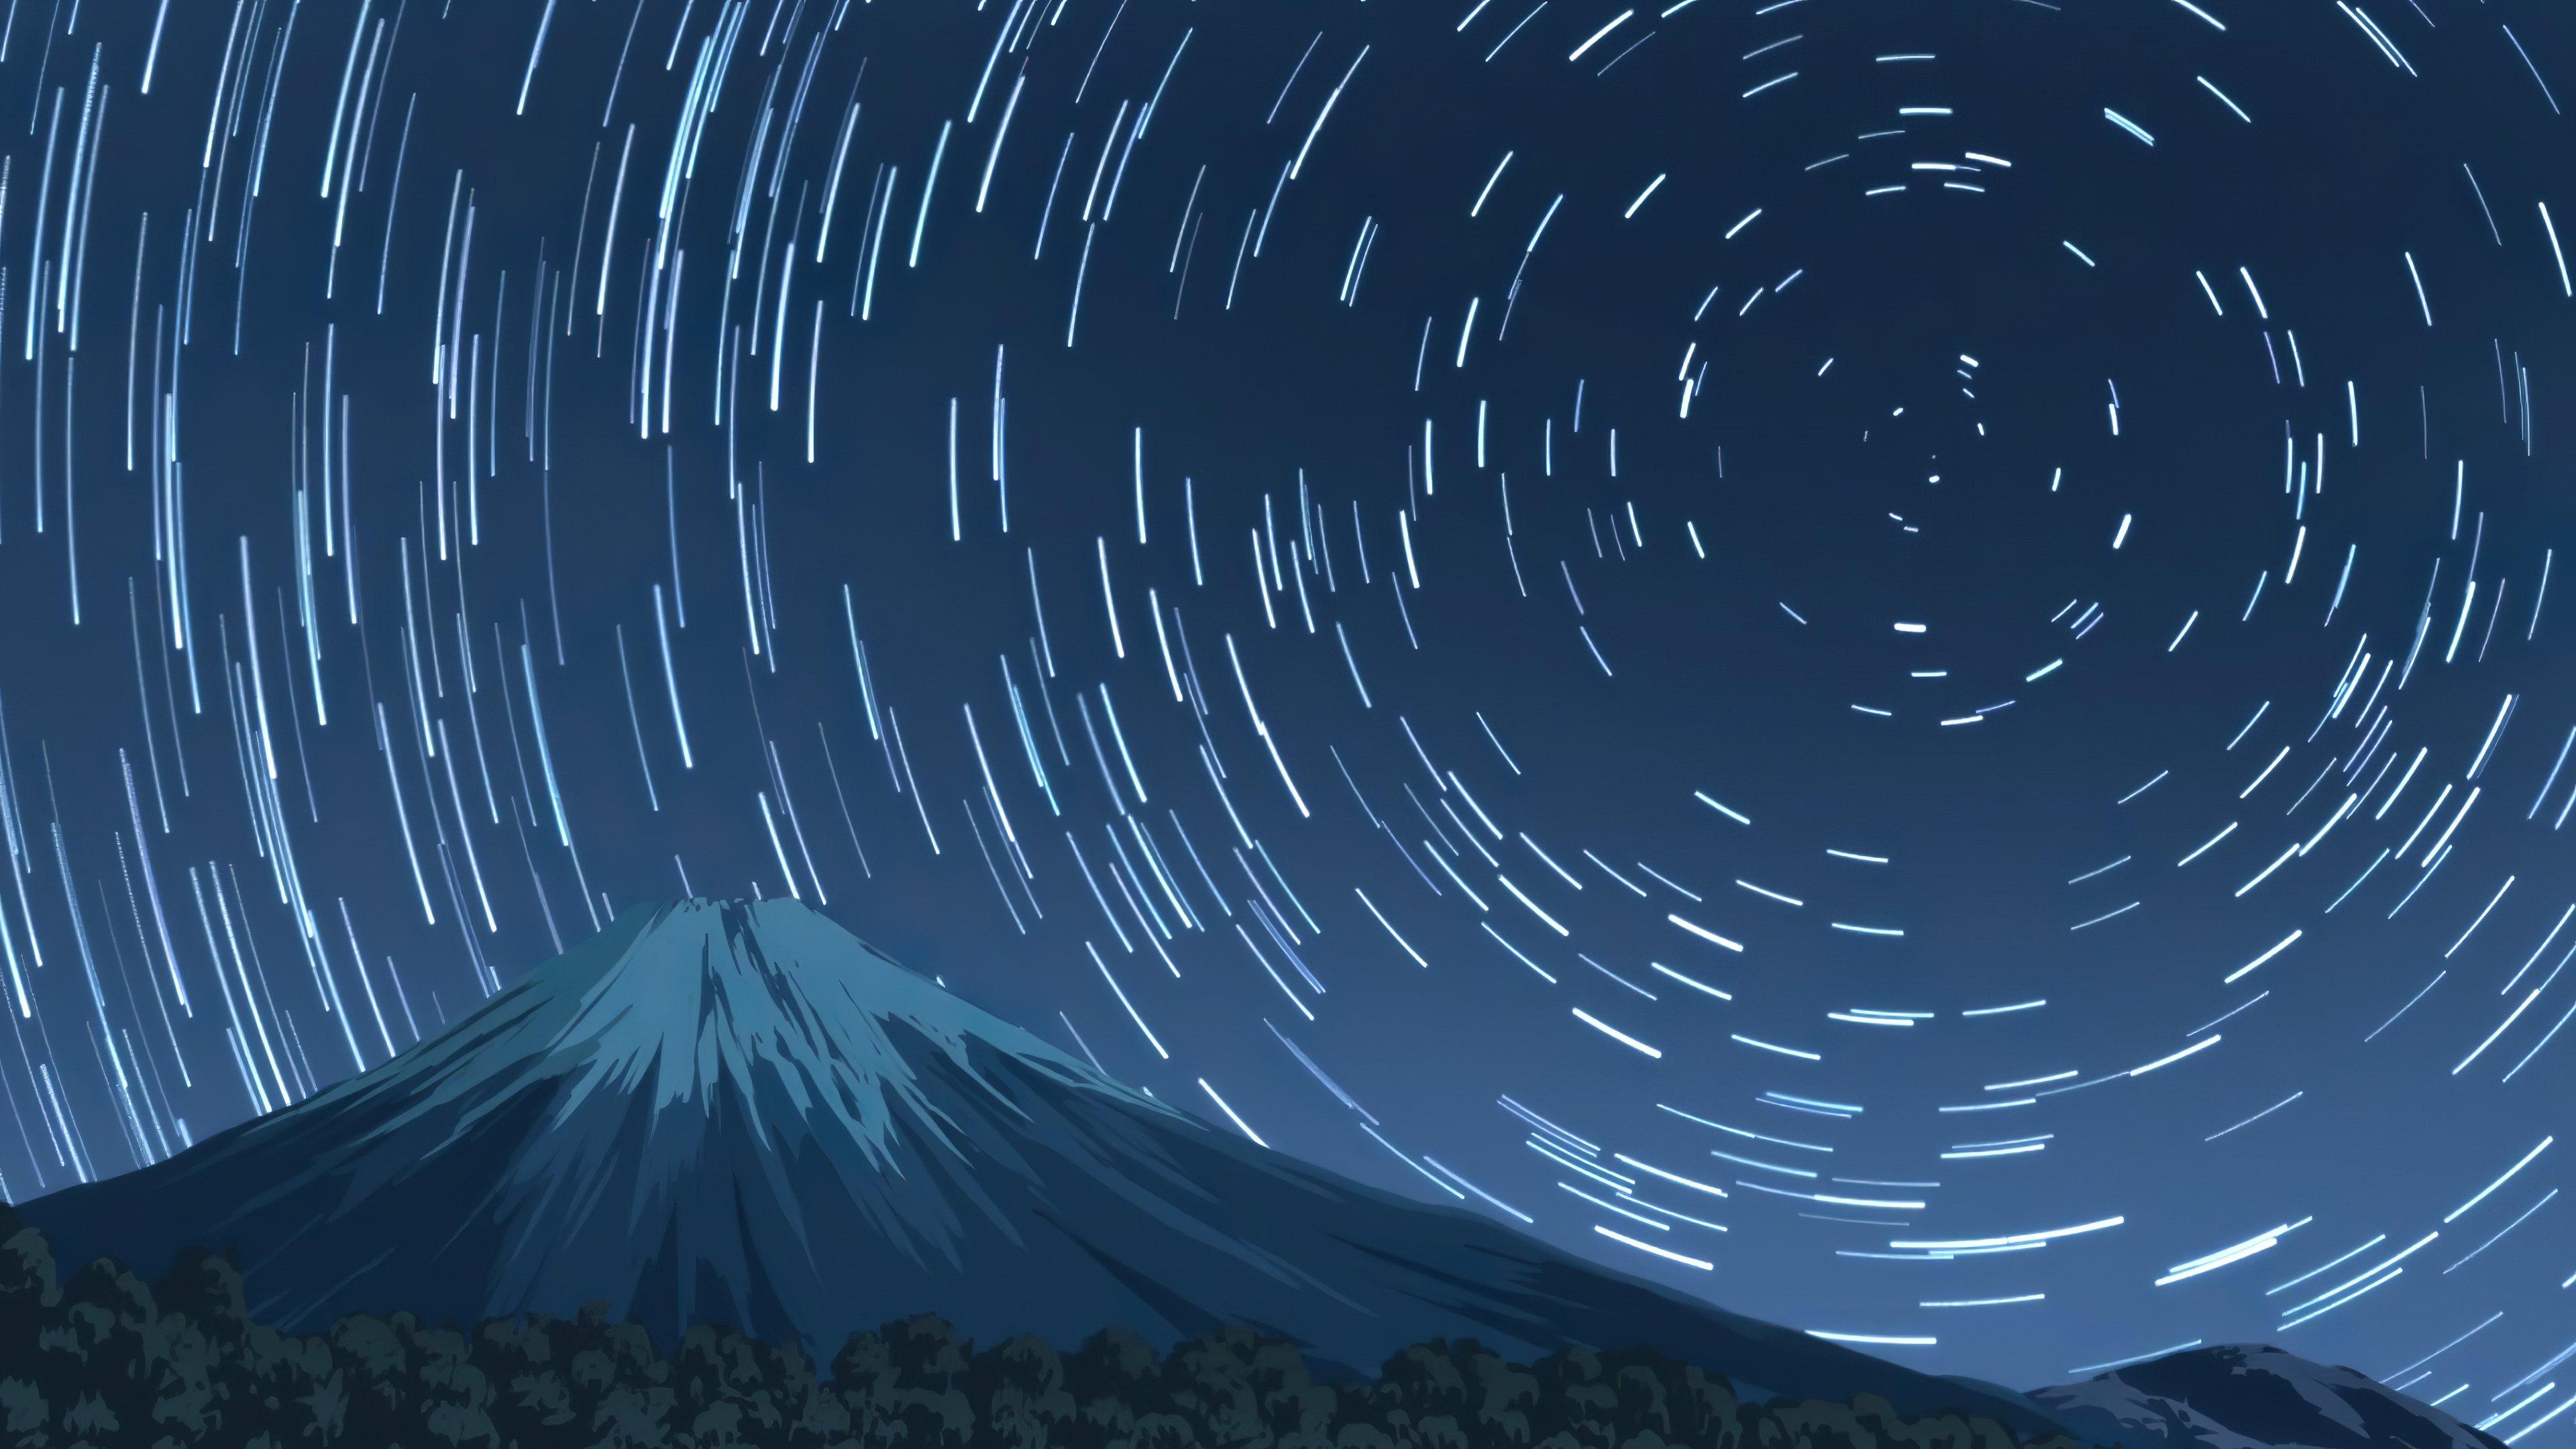 Mount Fuji From The Yuru Camp 4k Wallpaper